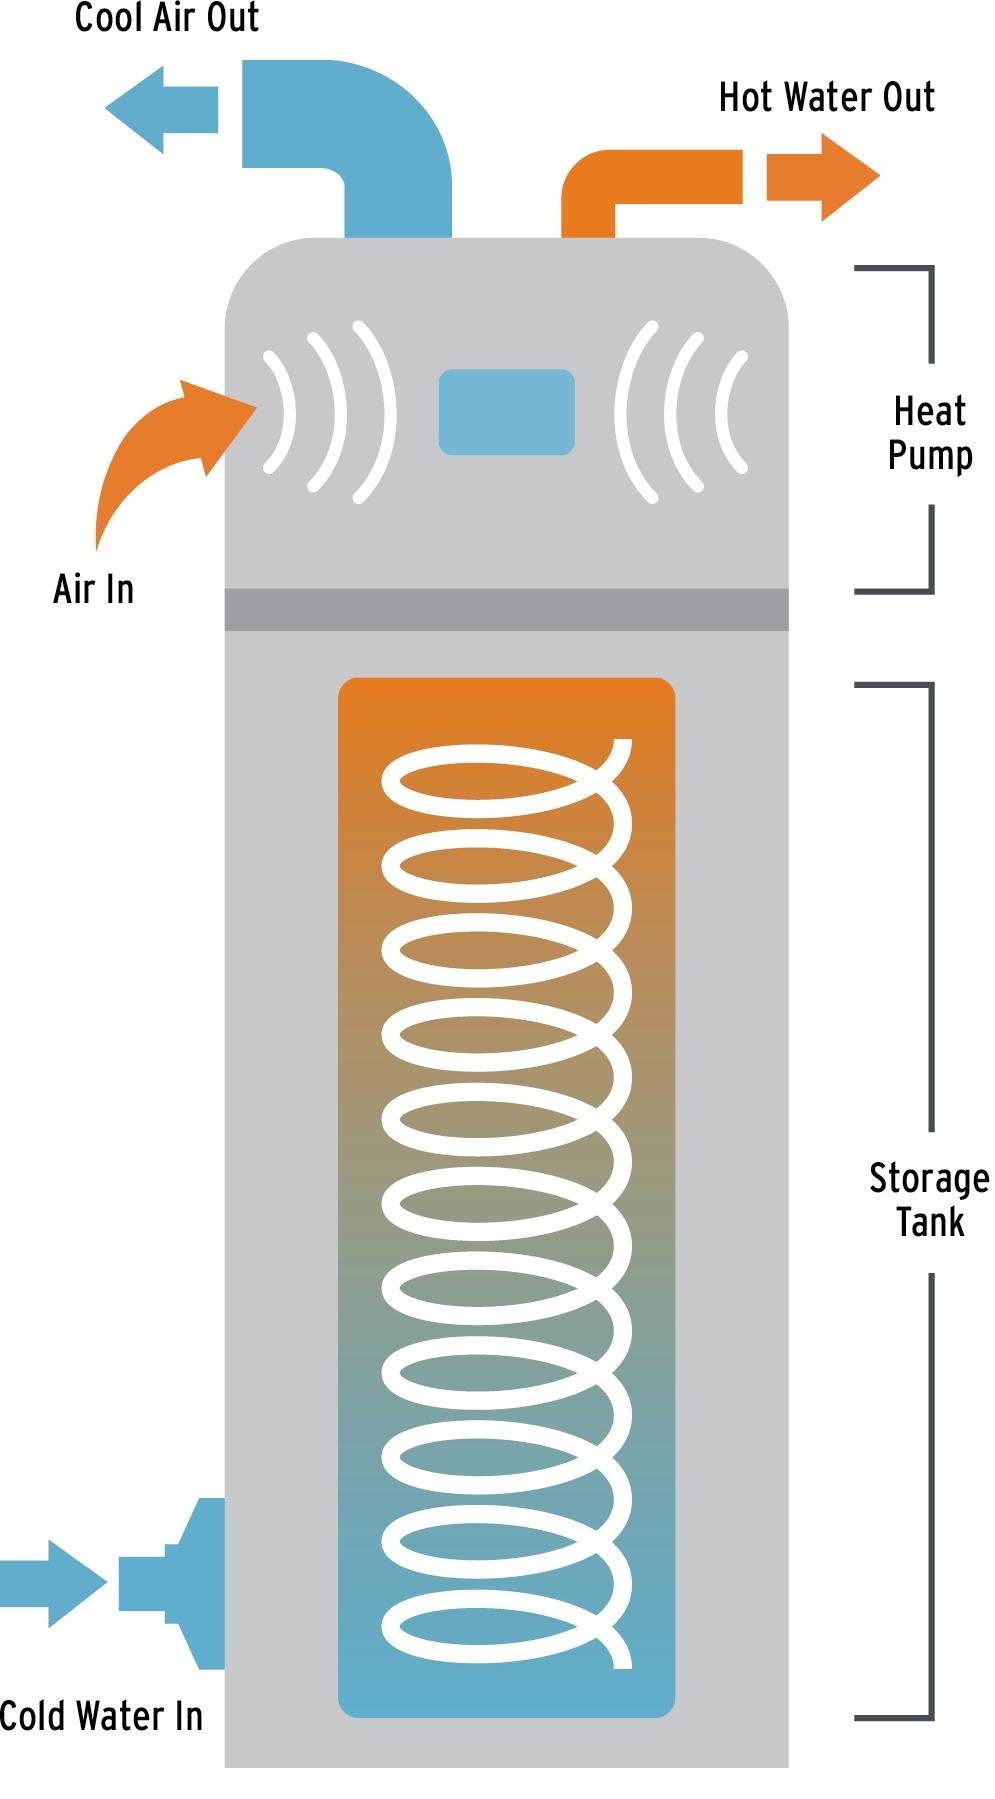 Heater Pump Heat Pump Water Heater Program Information Clallam County Pud